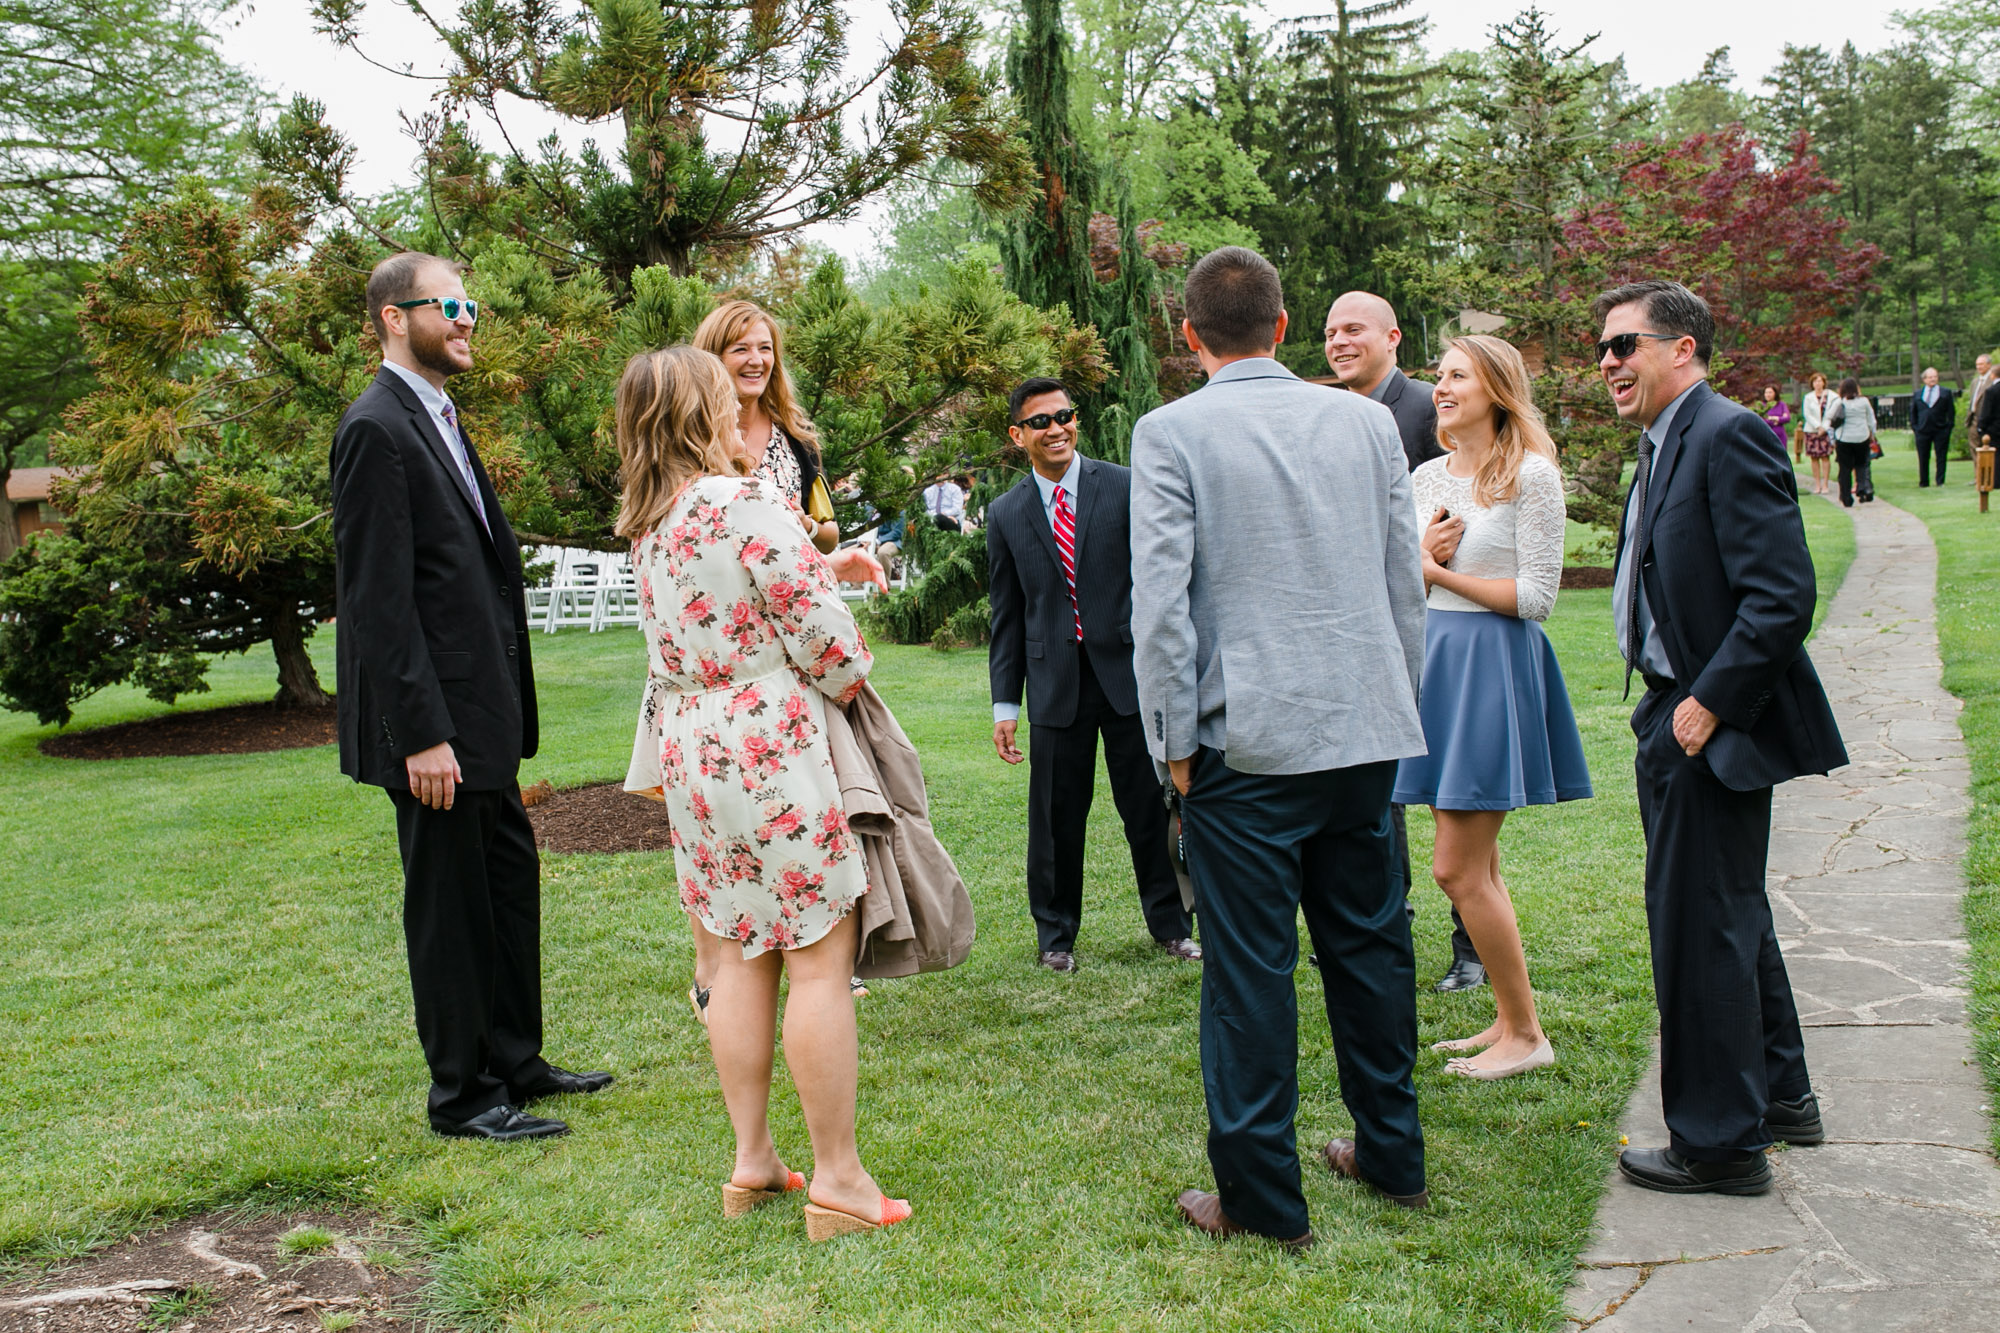 hensville-wedding-downtown-toledo-ohio (30 of 103).jpg